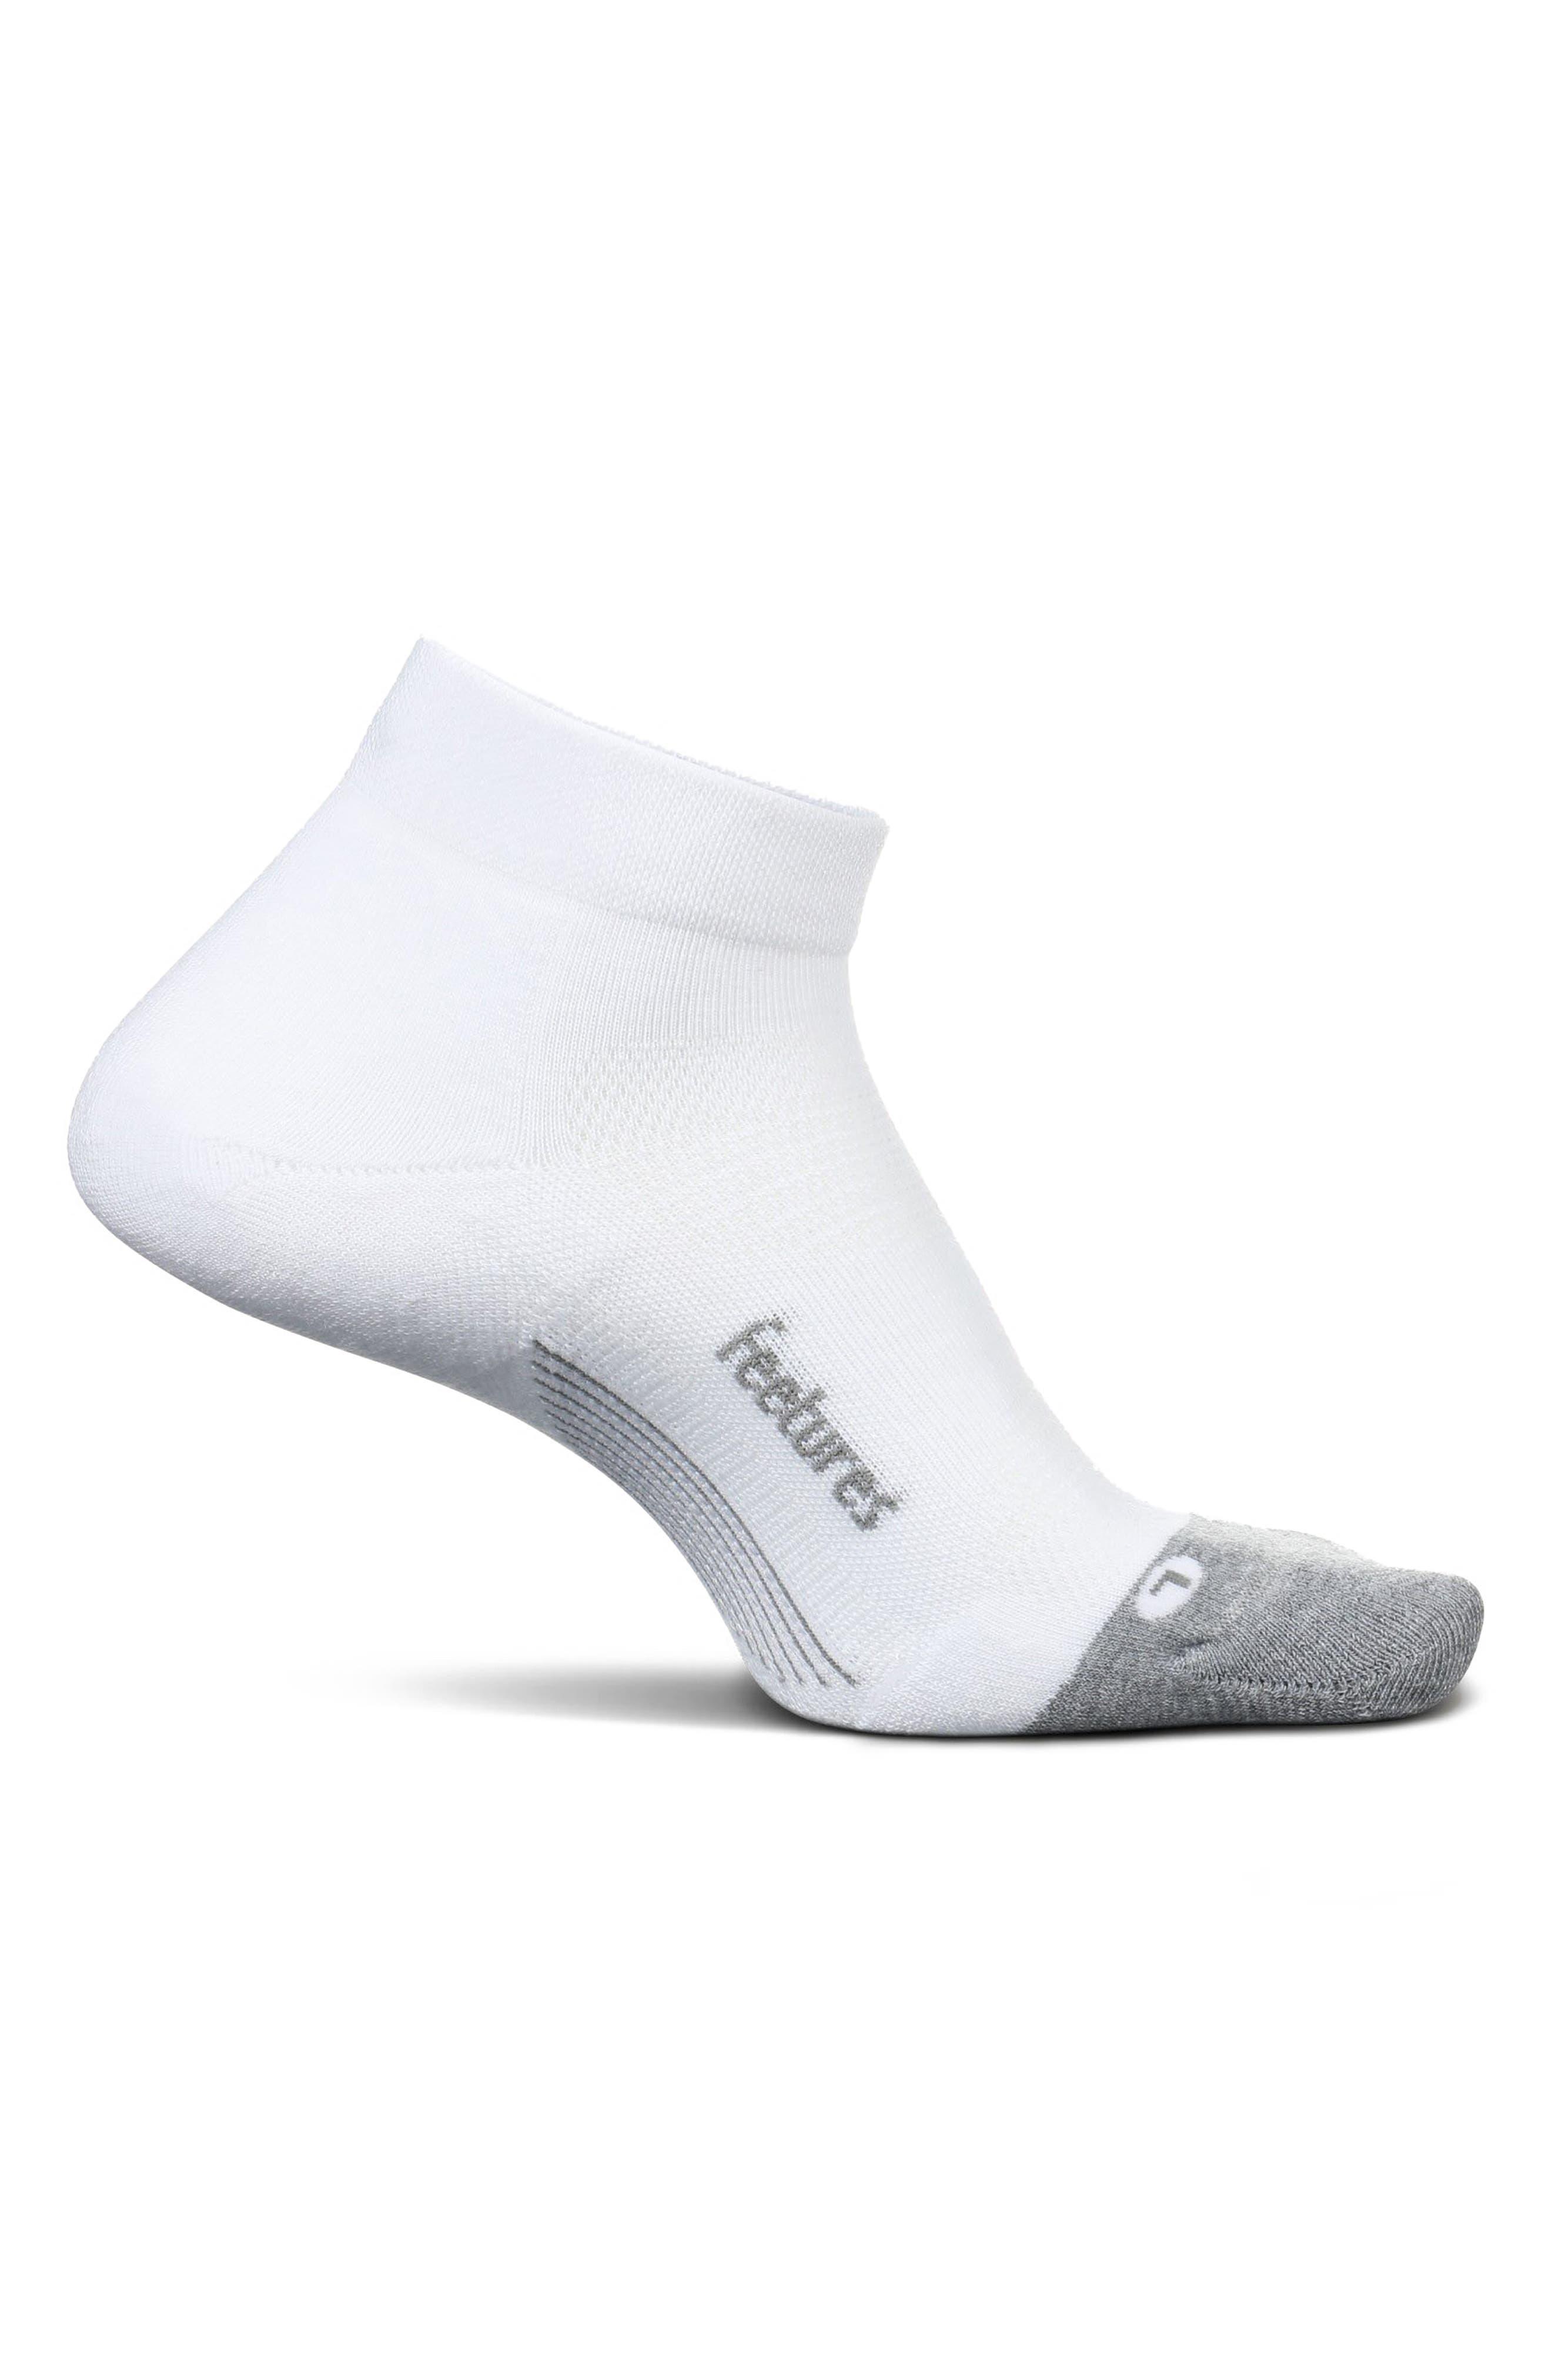 Elite Max Cushion Ankle Socks